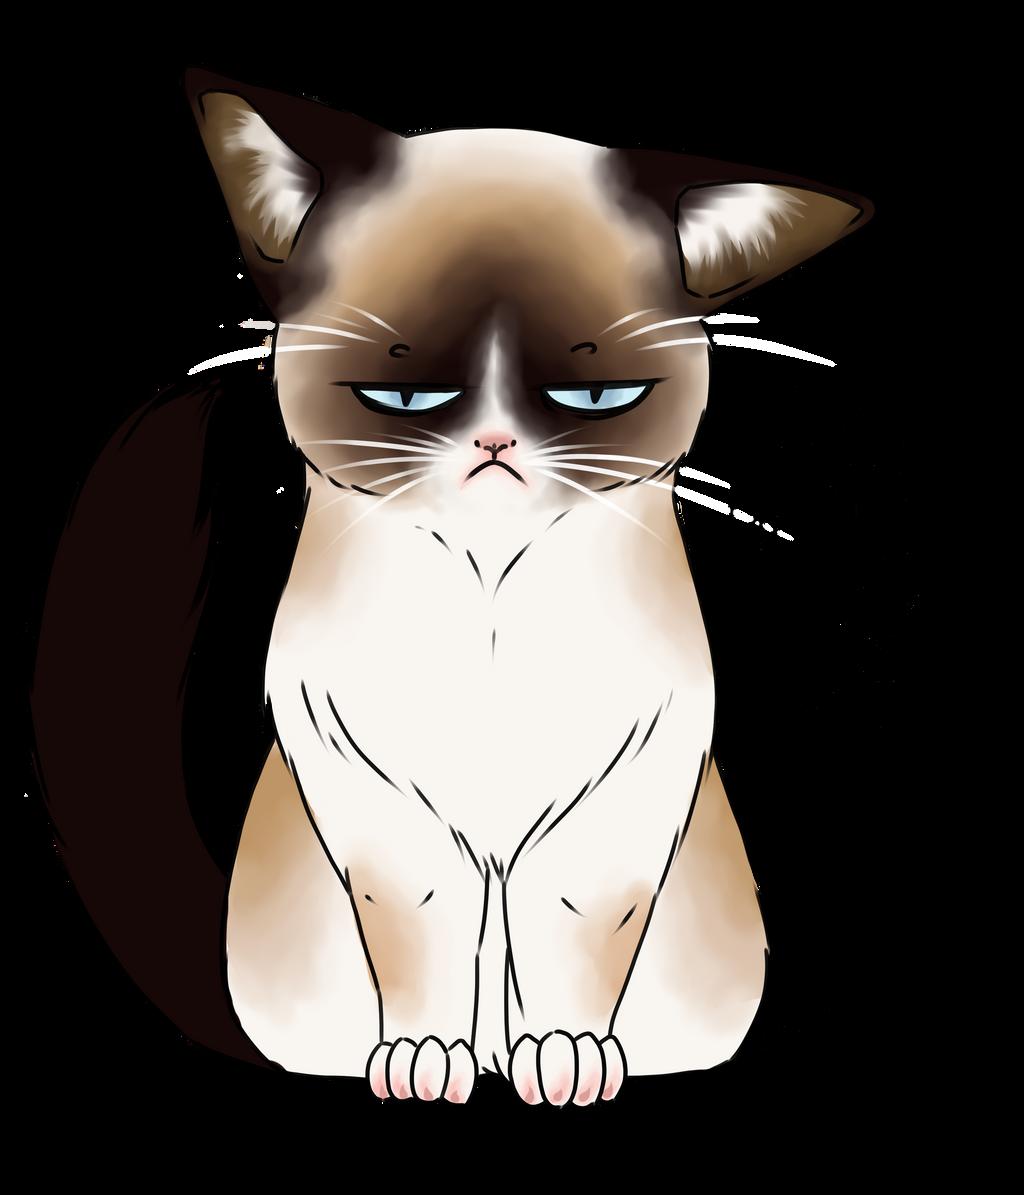 Grumpy Cat Face Drawing | www.imgkid.com - The Image Kid ...